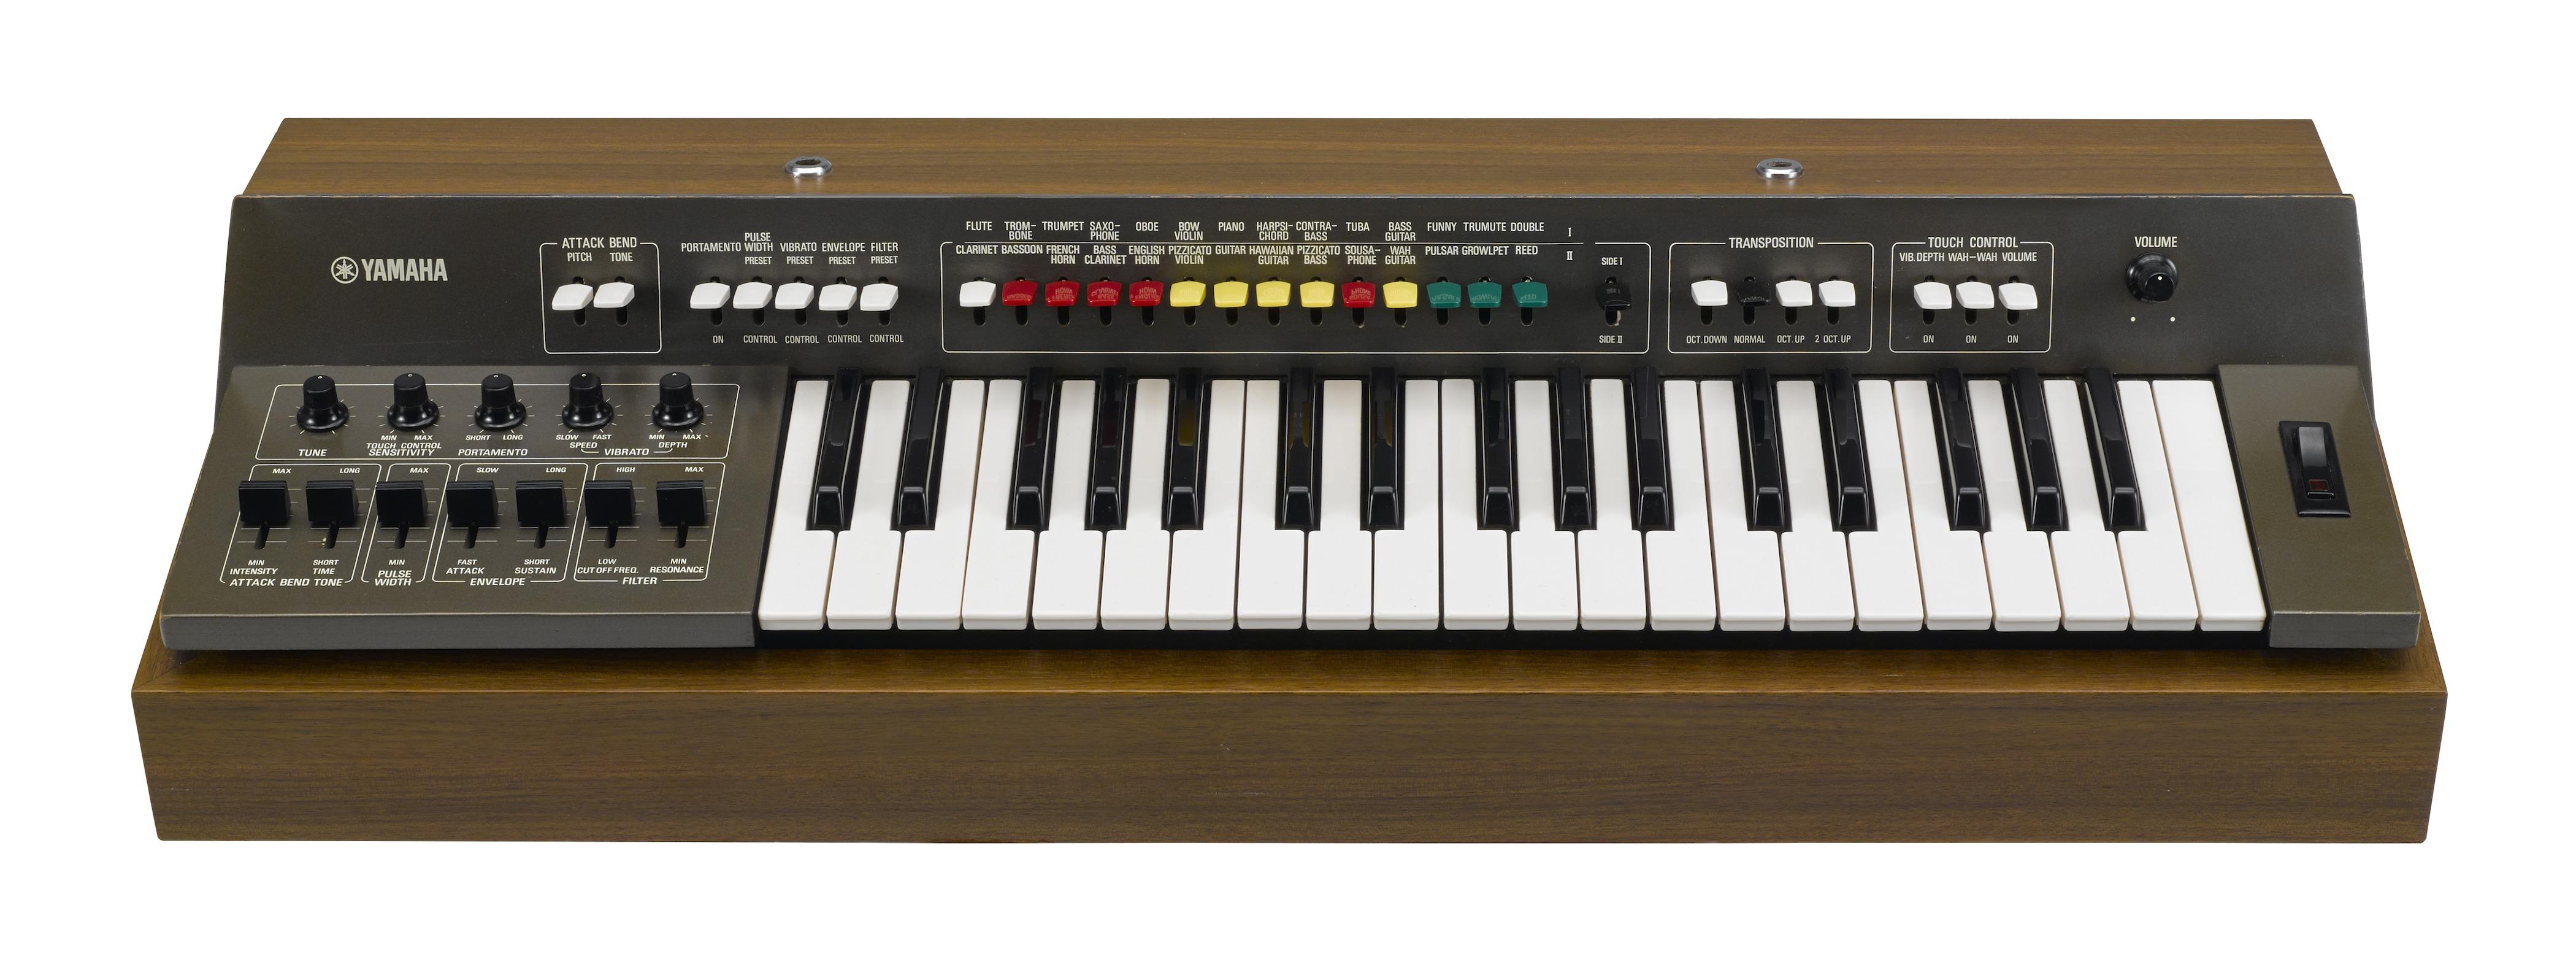 Yamaha Sy Vintage Synth